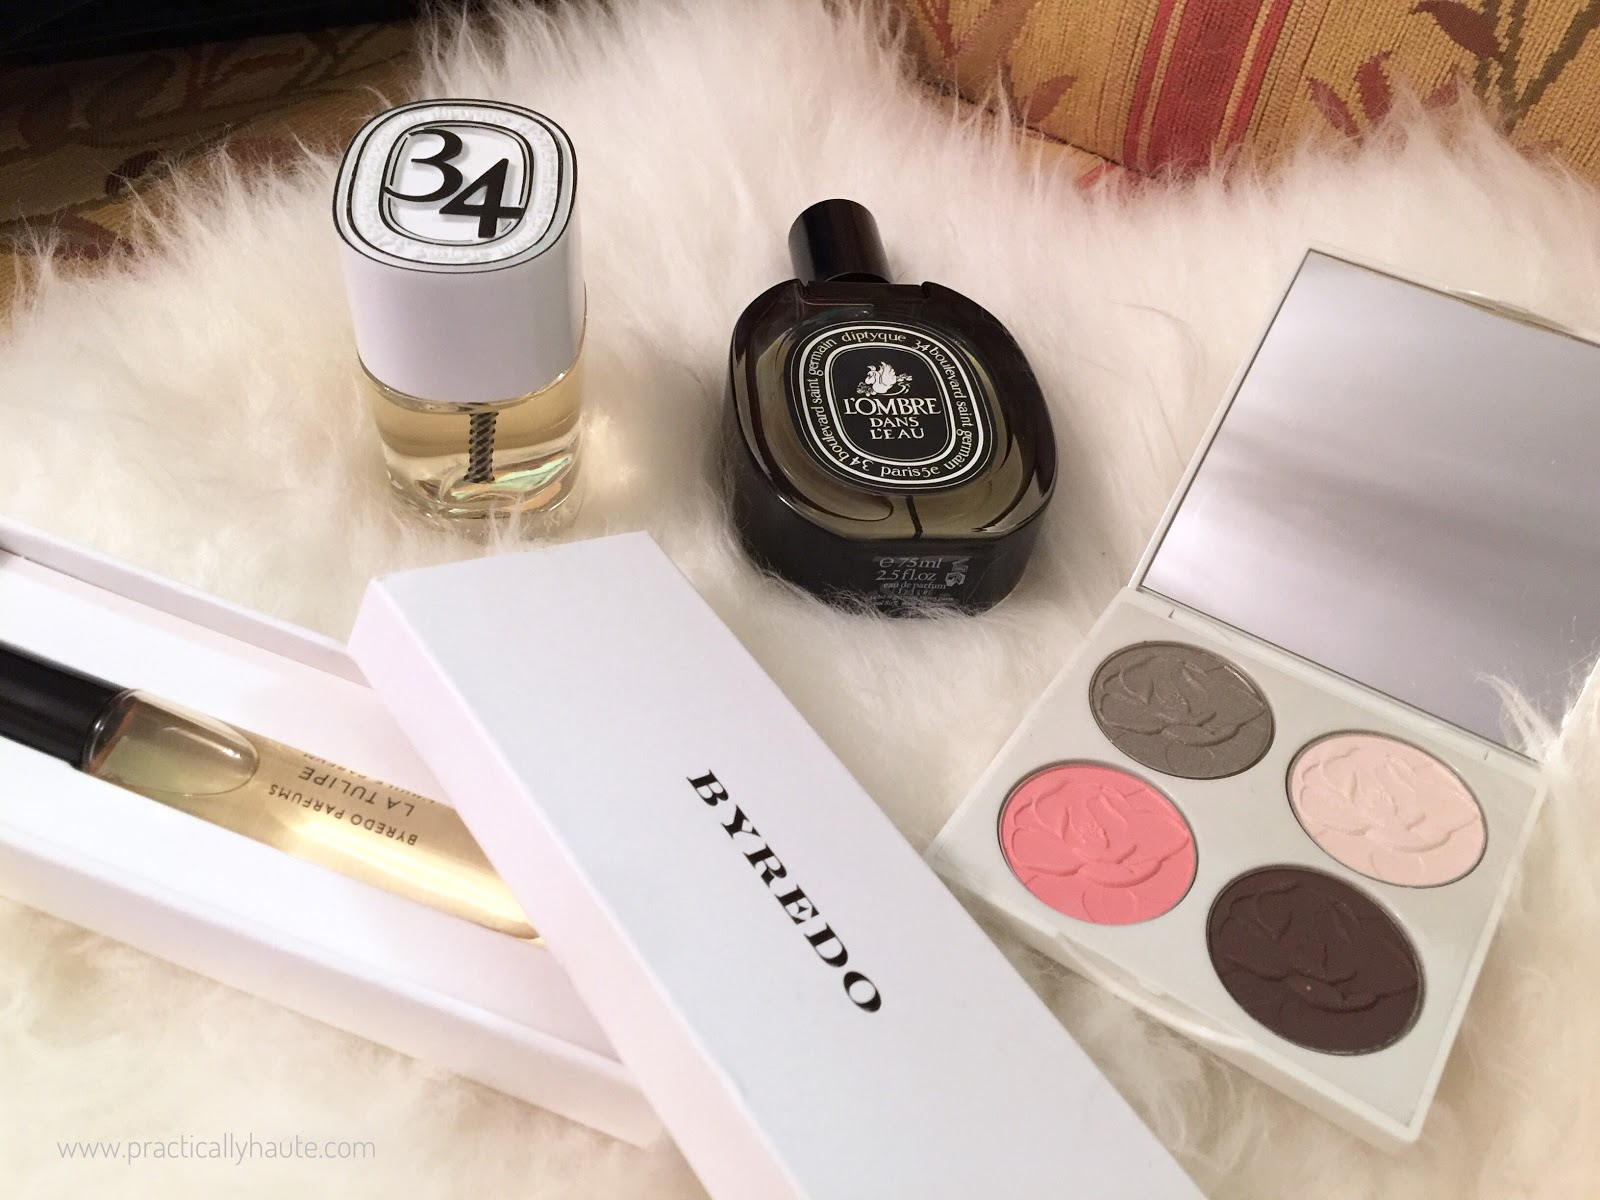 Space NK NYC sample sale beauty fragrance haul